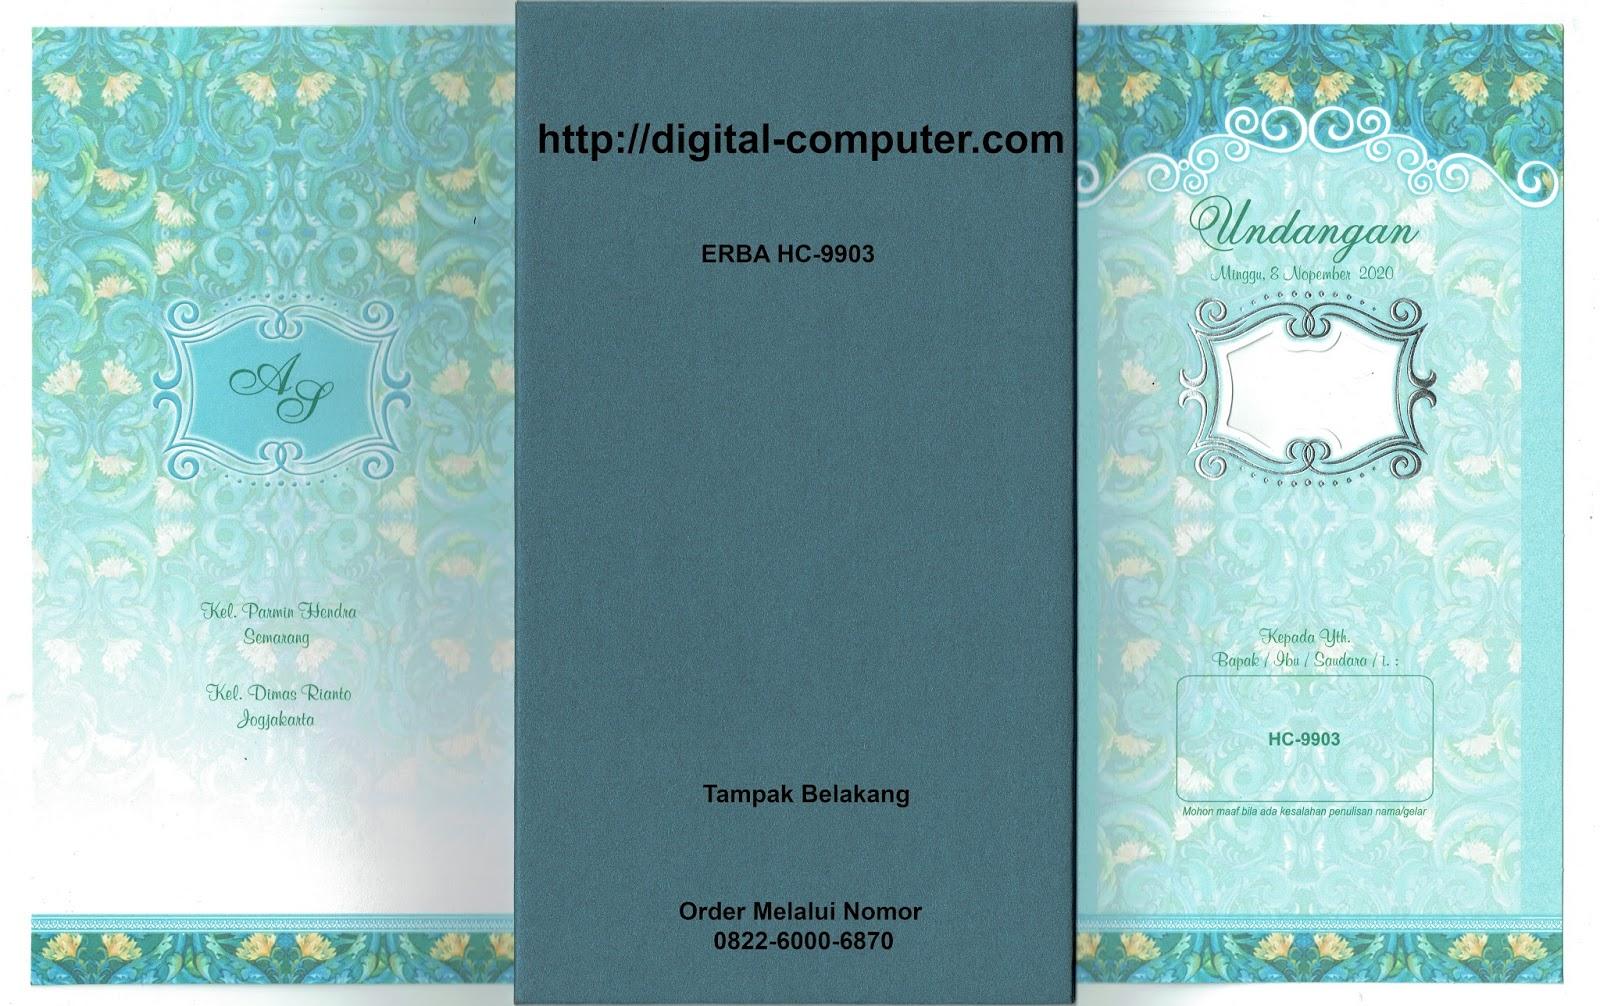 undangan hardcover ERBA HC-9903